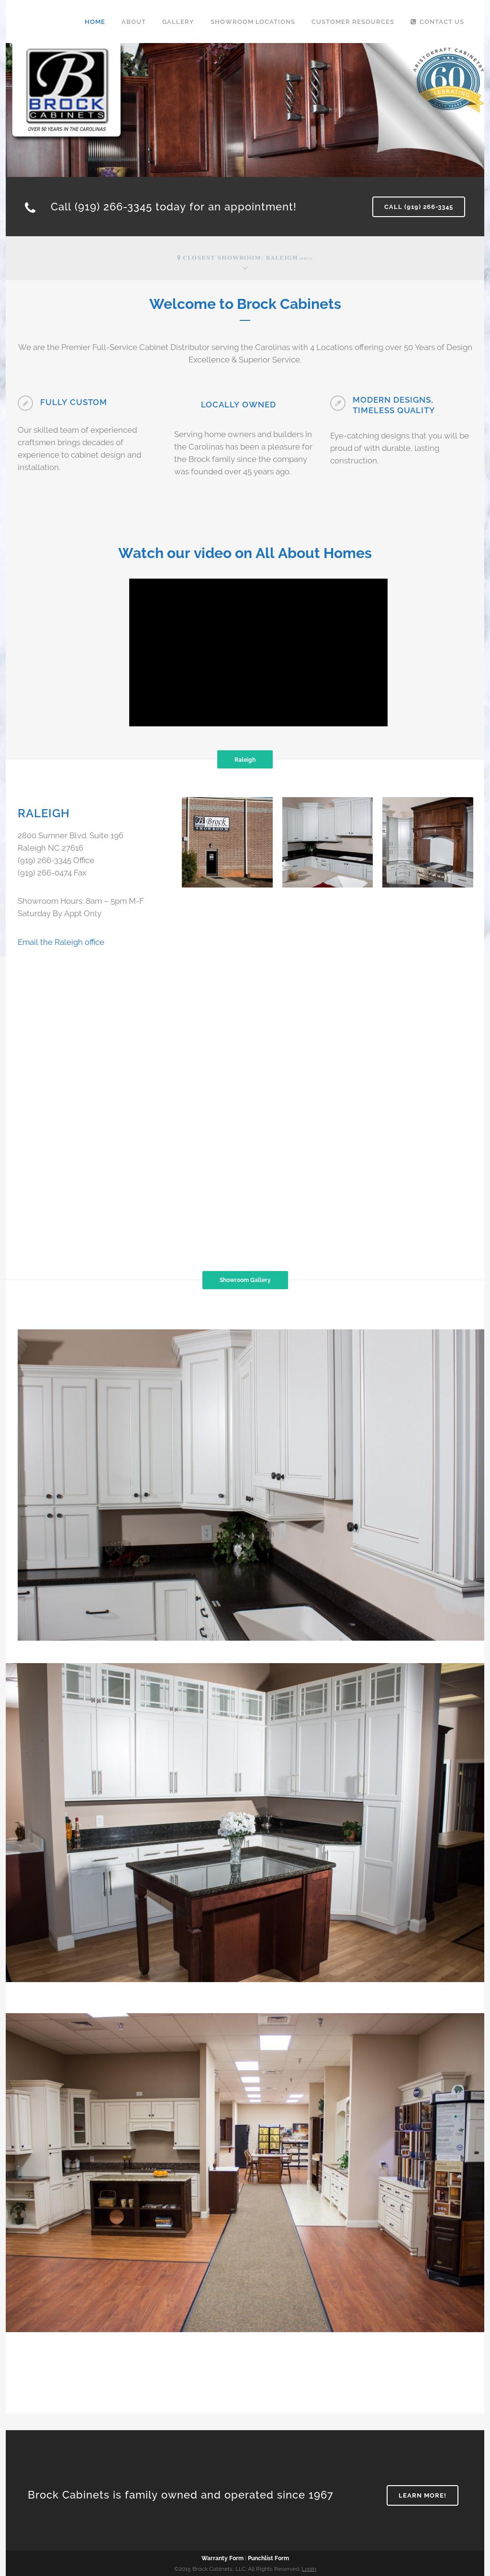 Brock Cabinets Website History